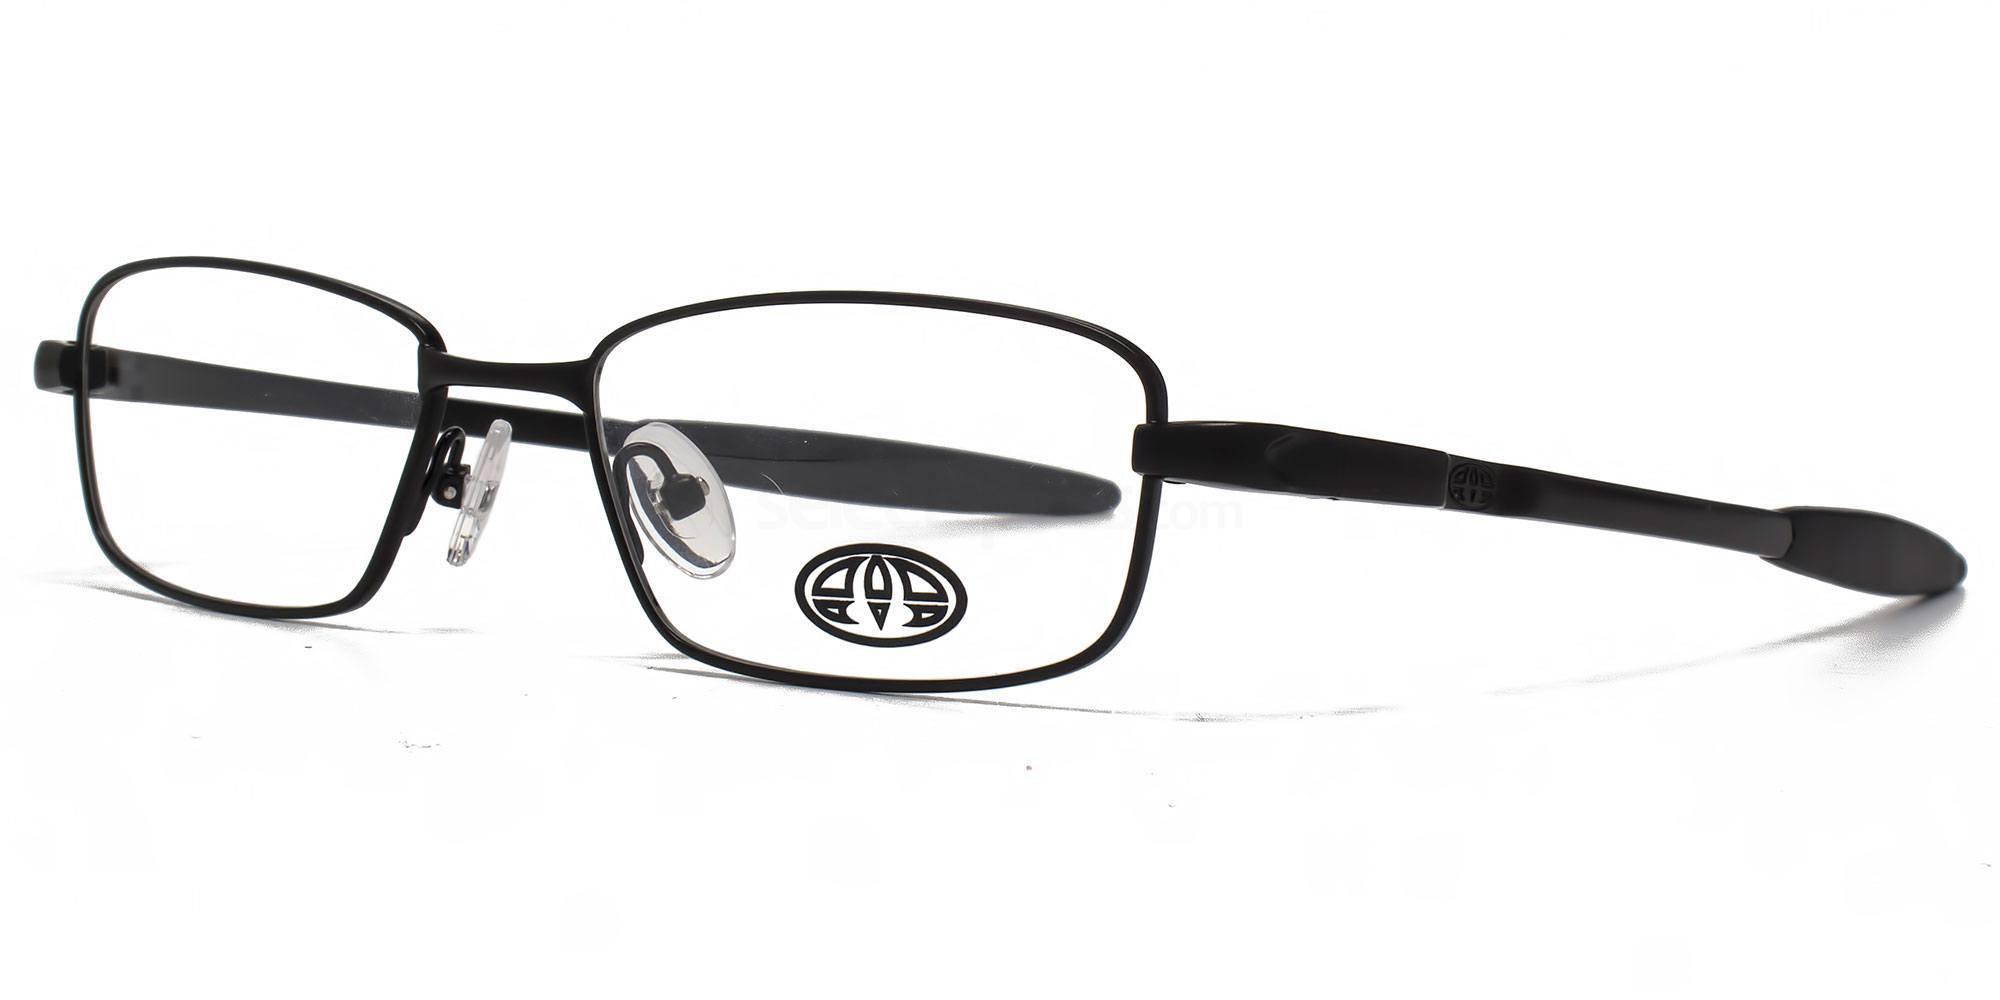 BLK ANIS009 - LAWTON Glasses, Animal